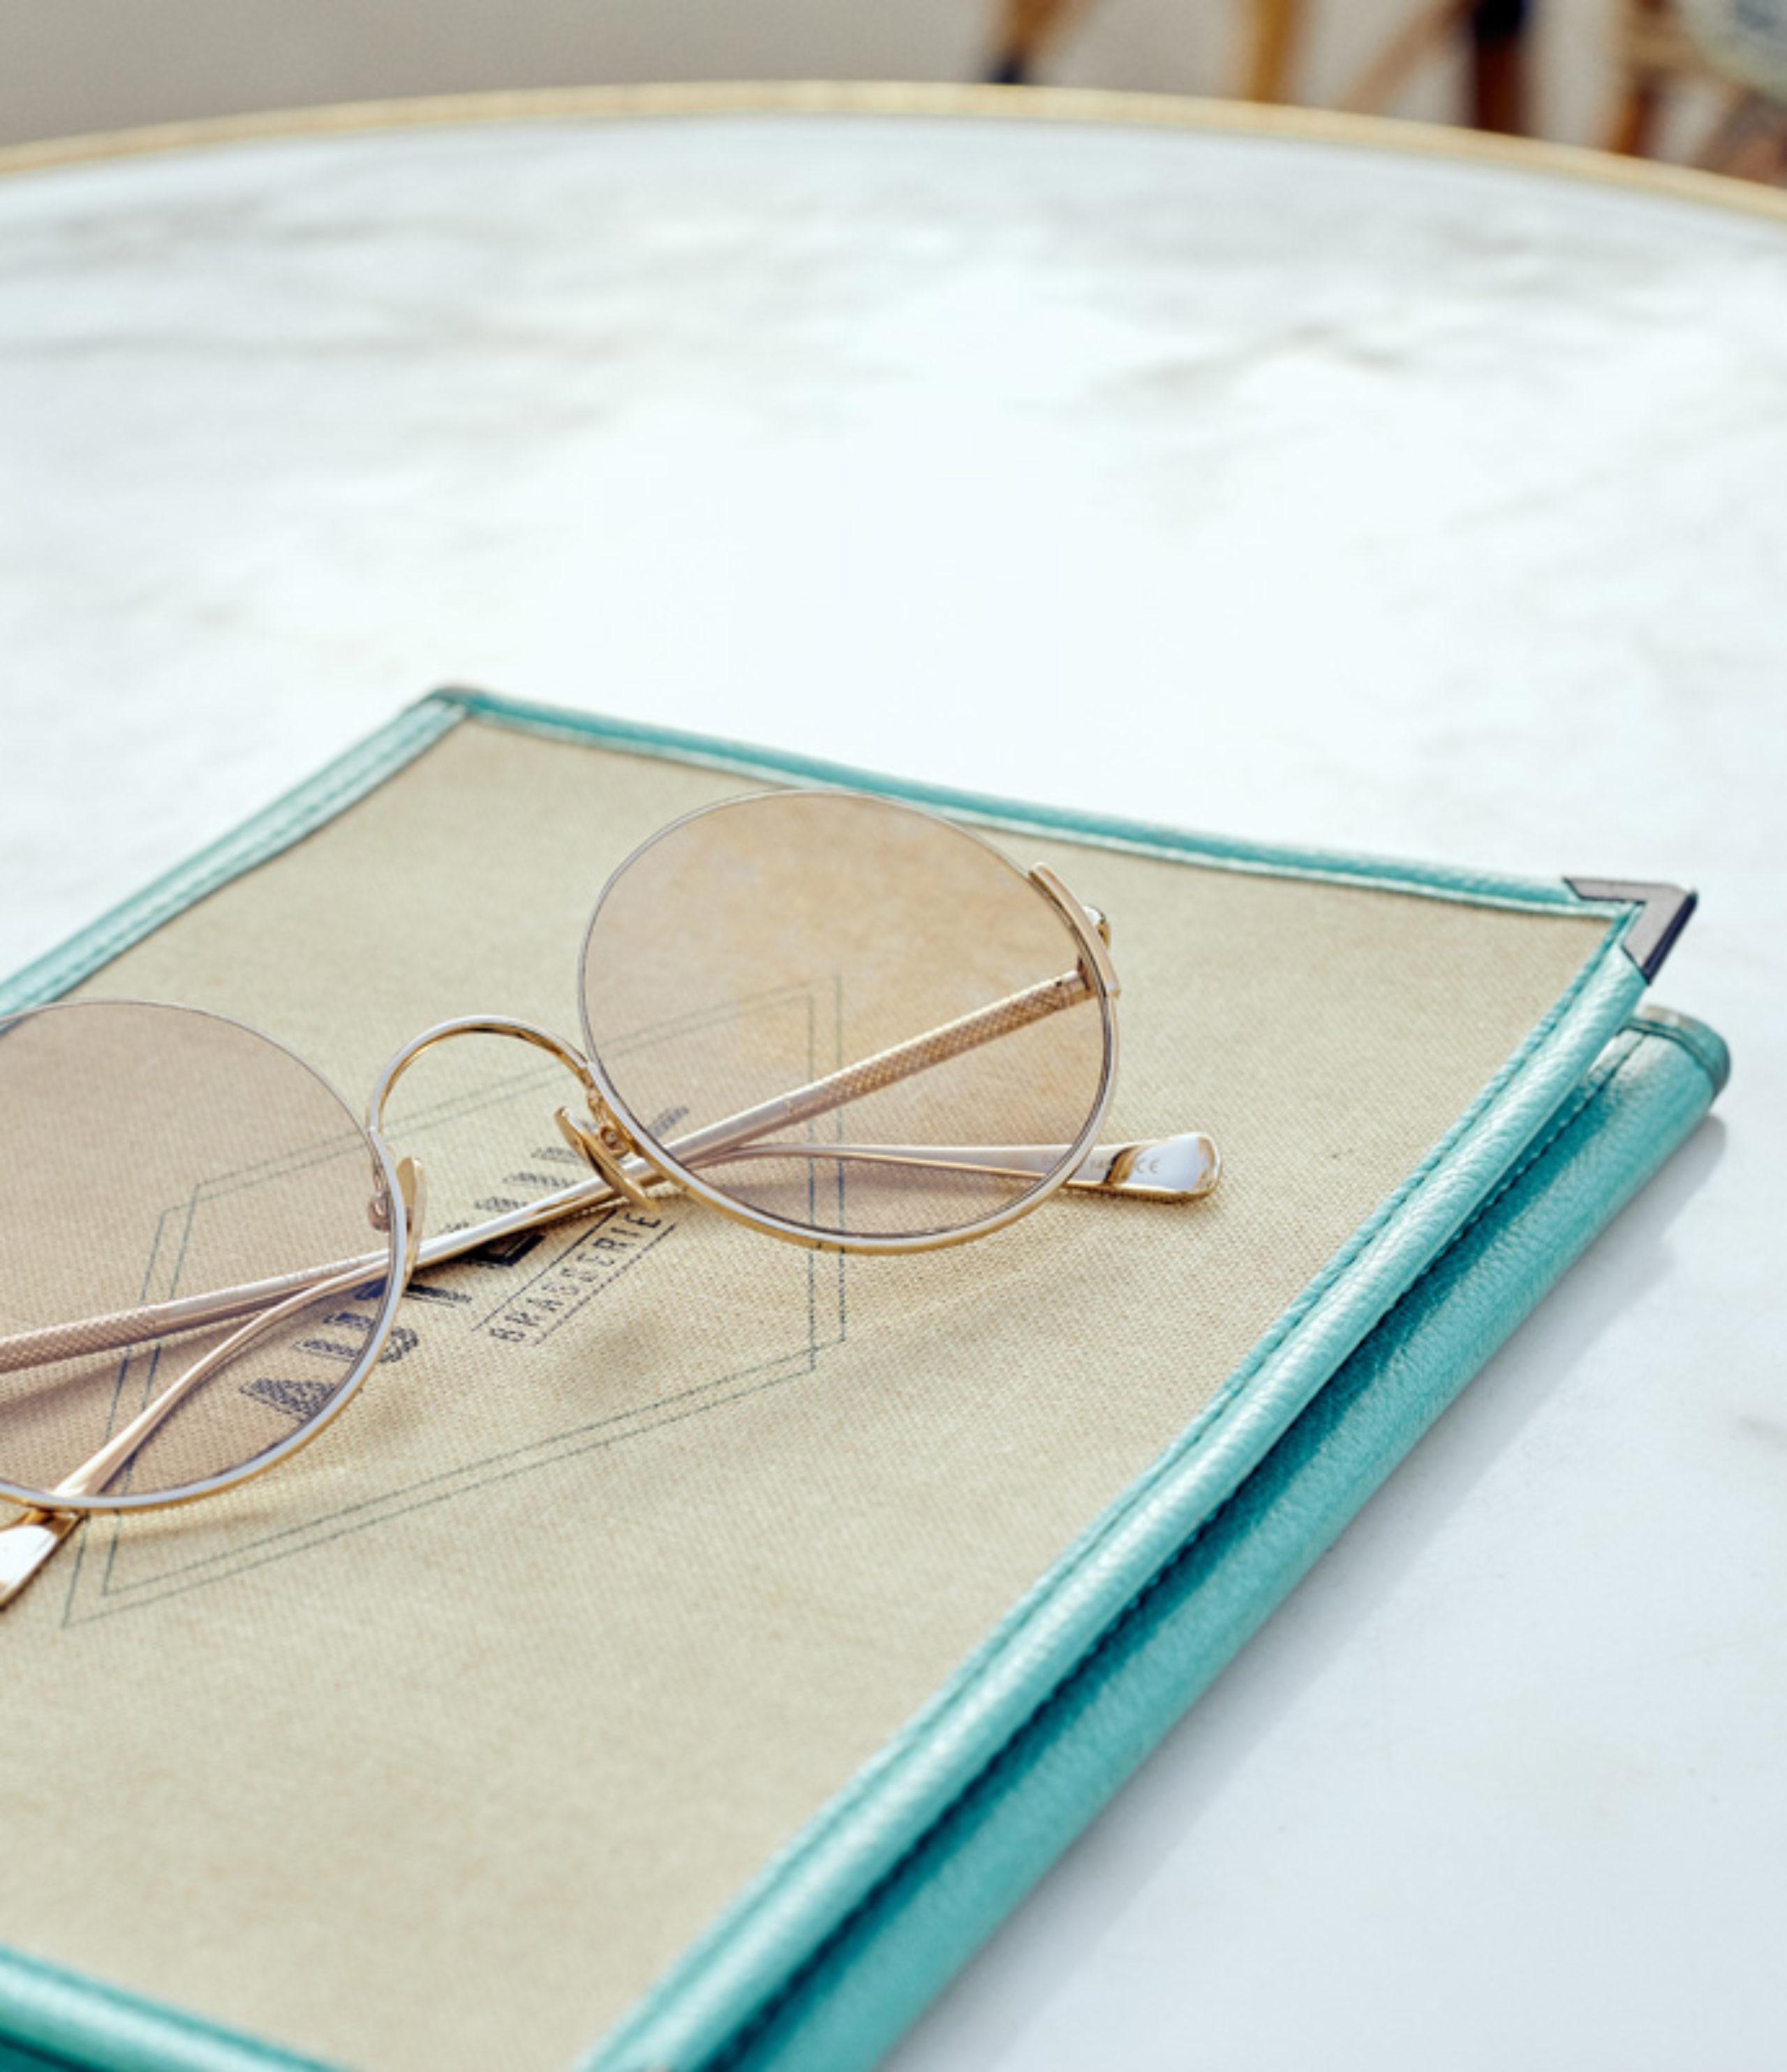 Sunday Somewhere brillen en zonnebrillen - Frames and Faces Deinze